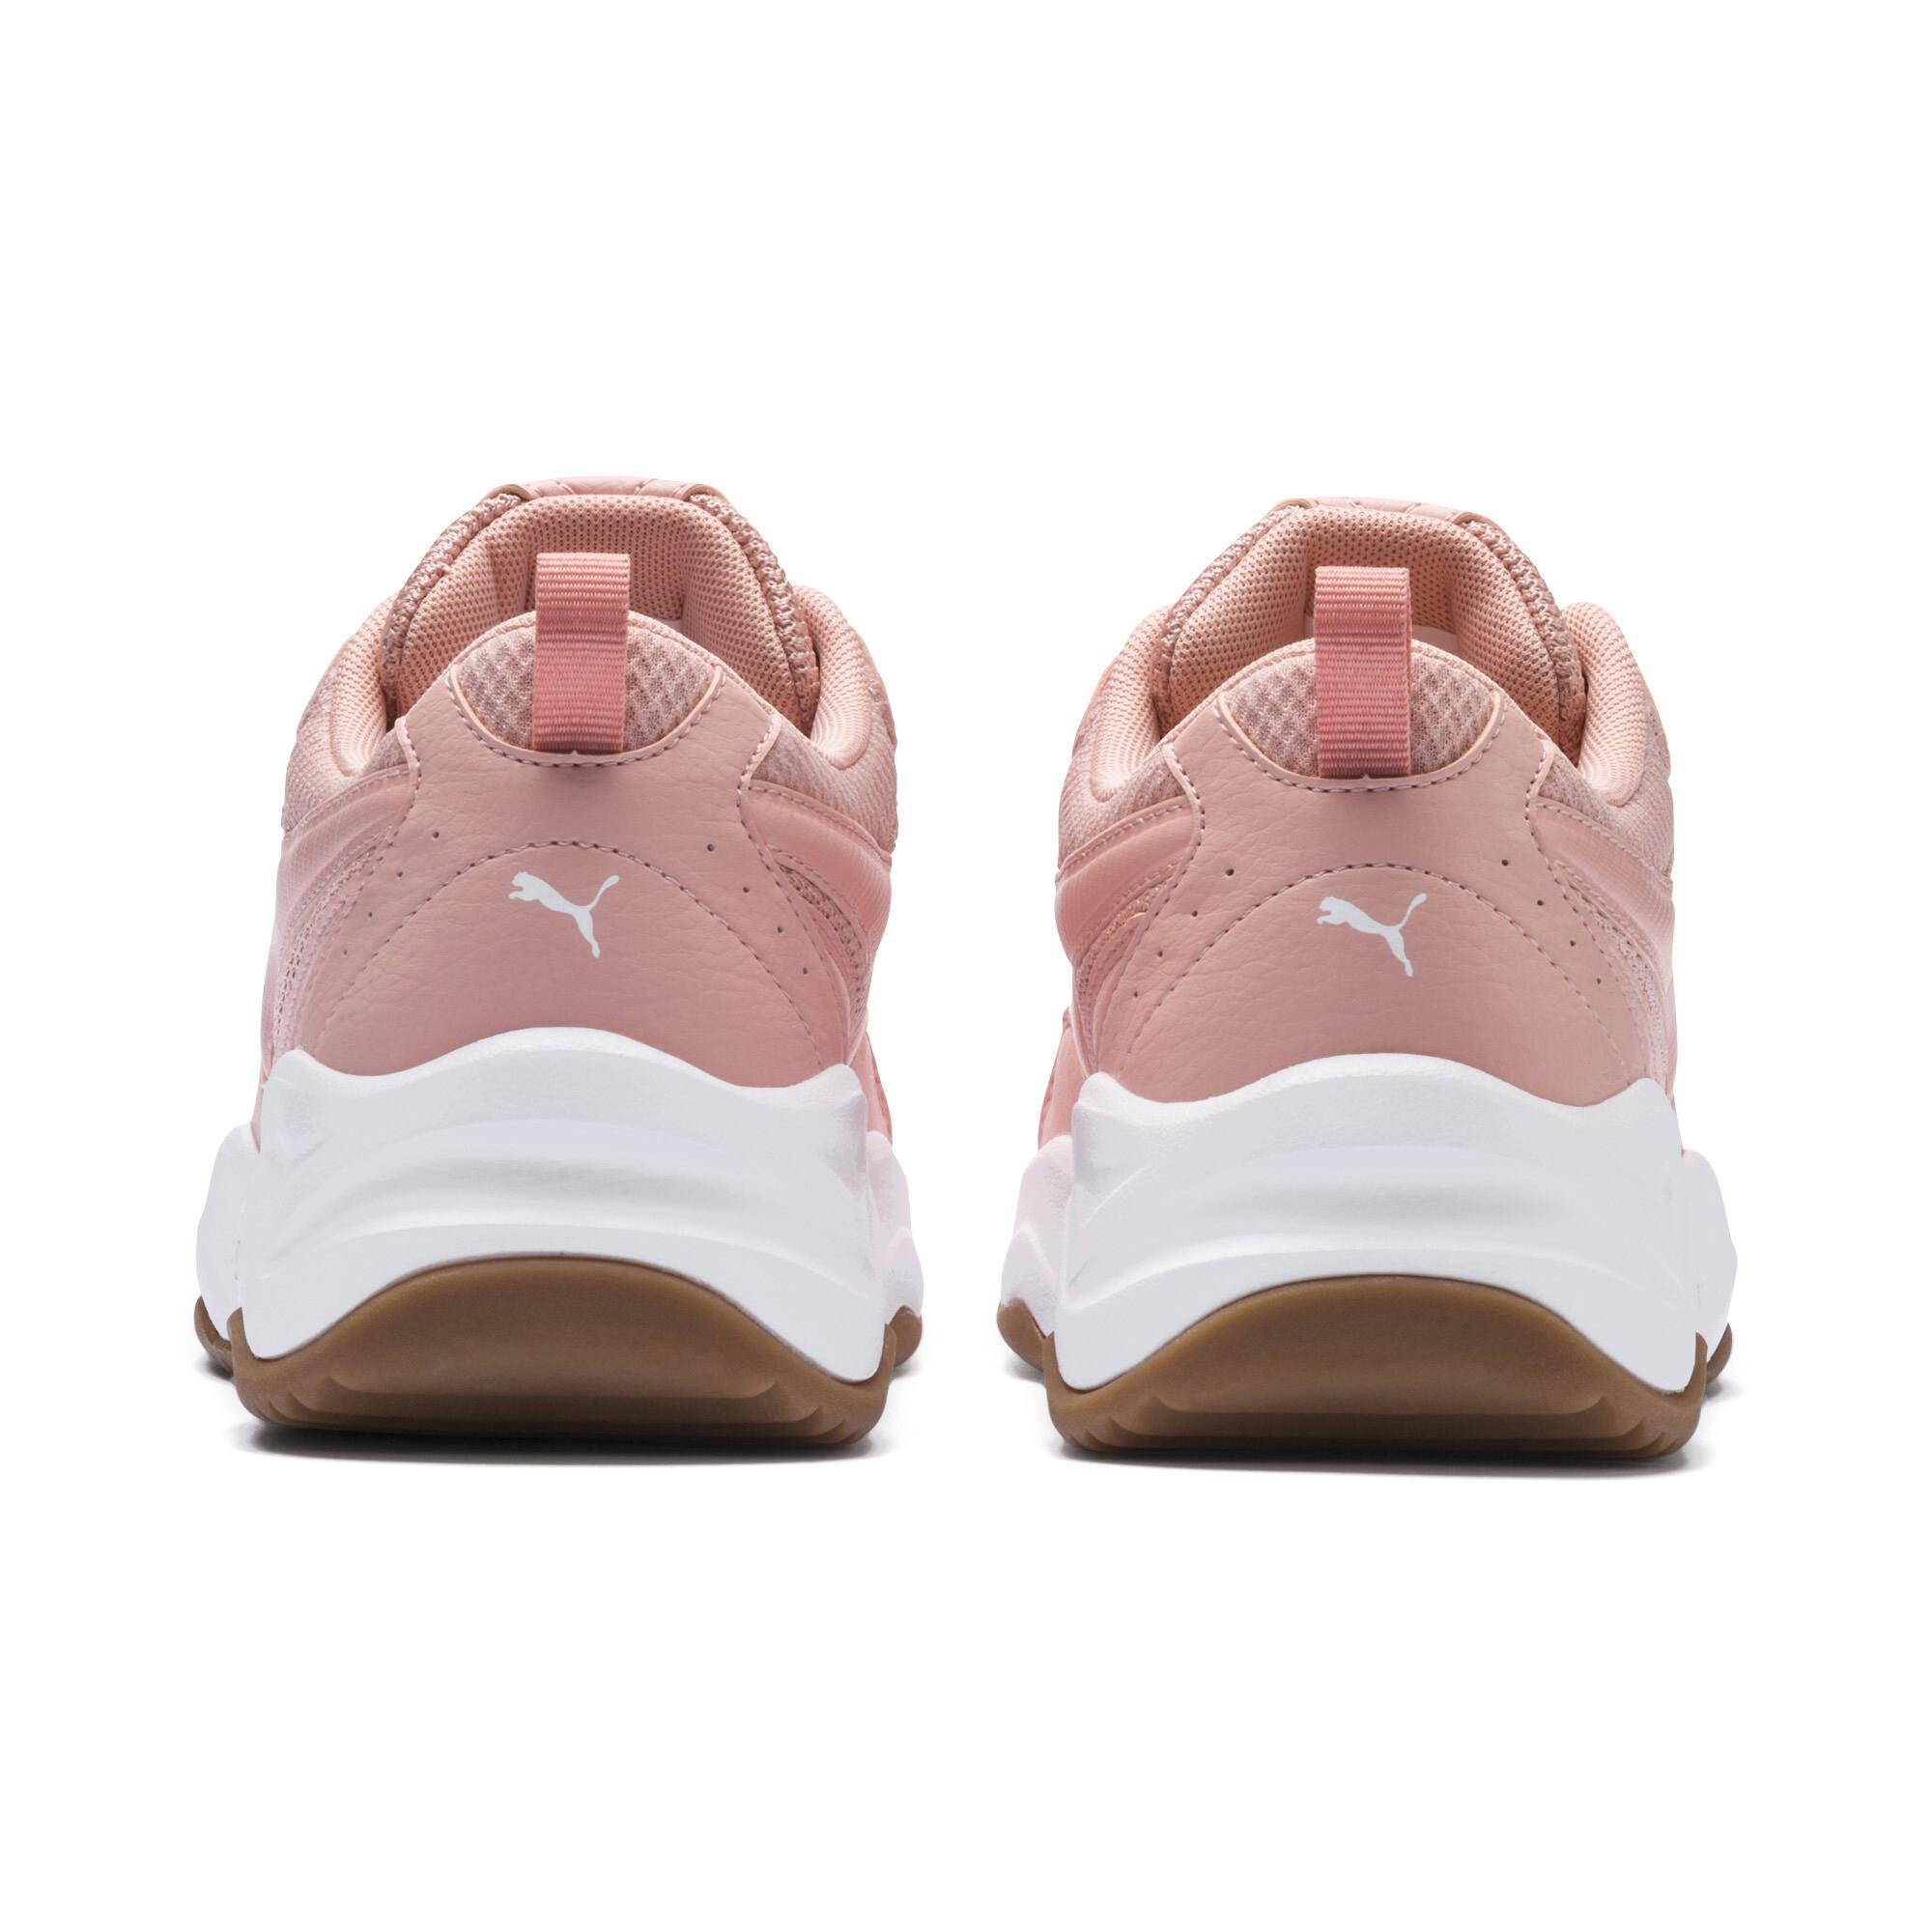 PUMA-Cilia-Women-039-s-Sneakers-Women-Shoe-Basics thumbnail 3